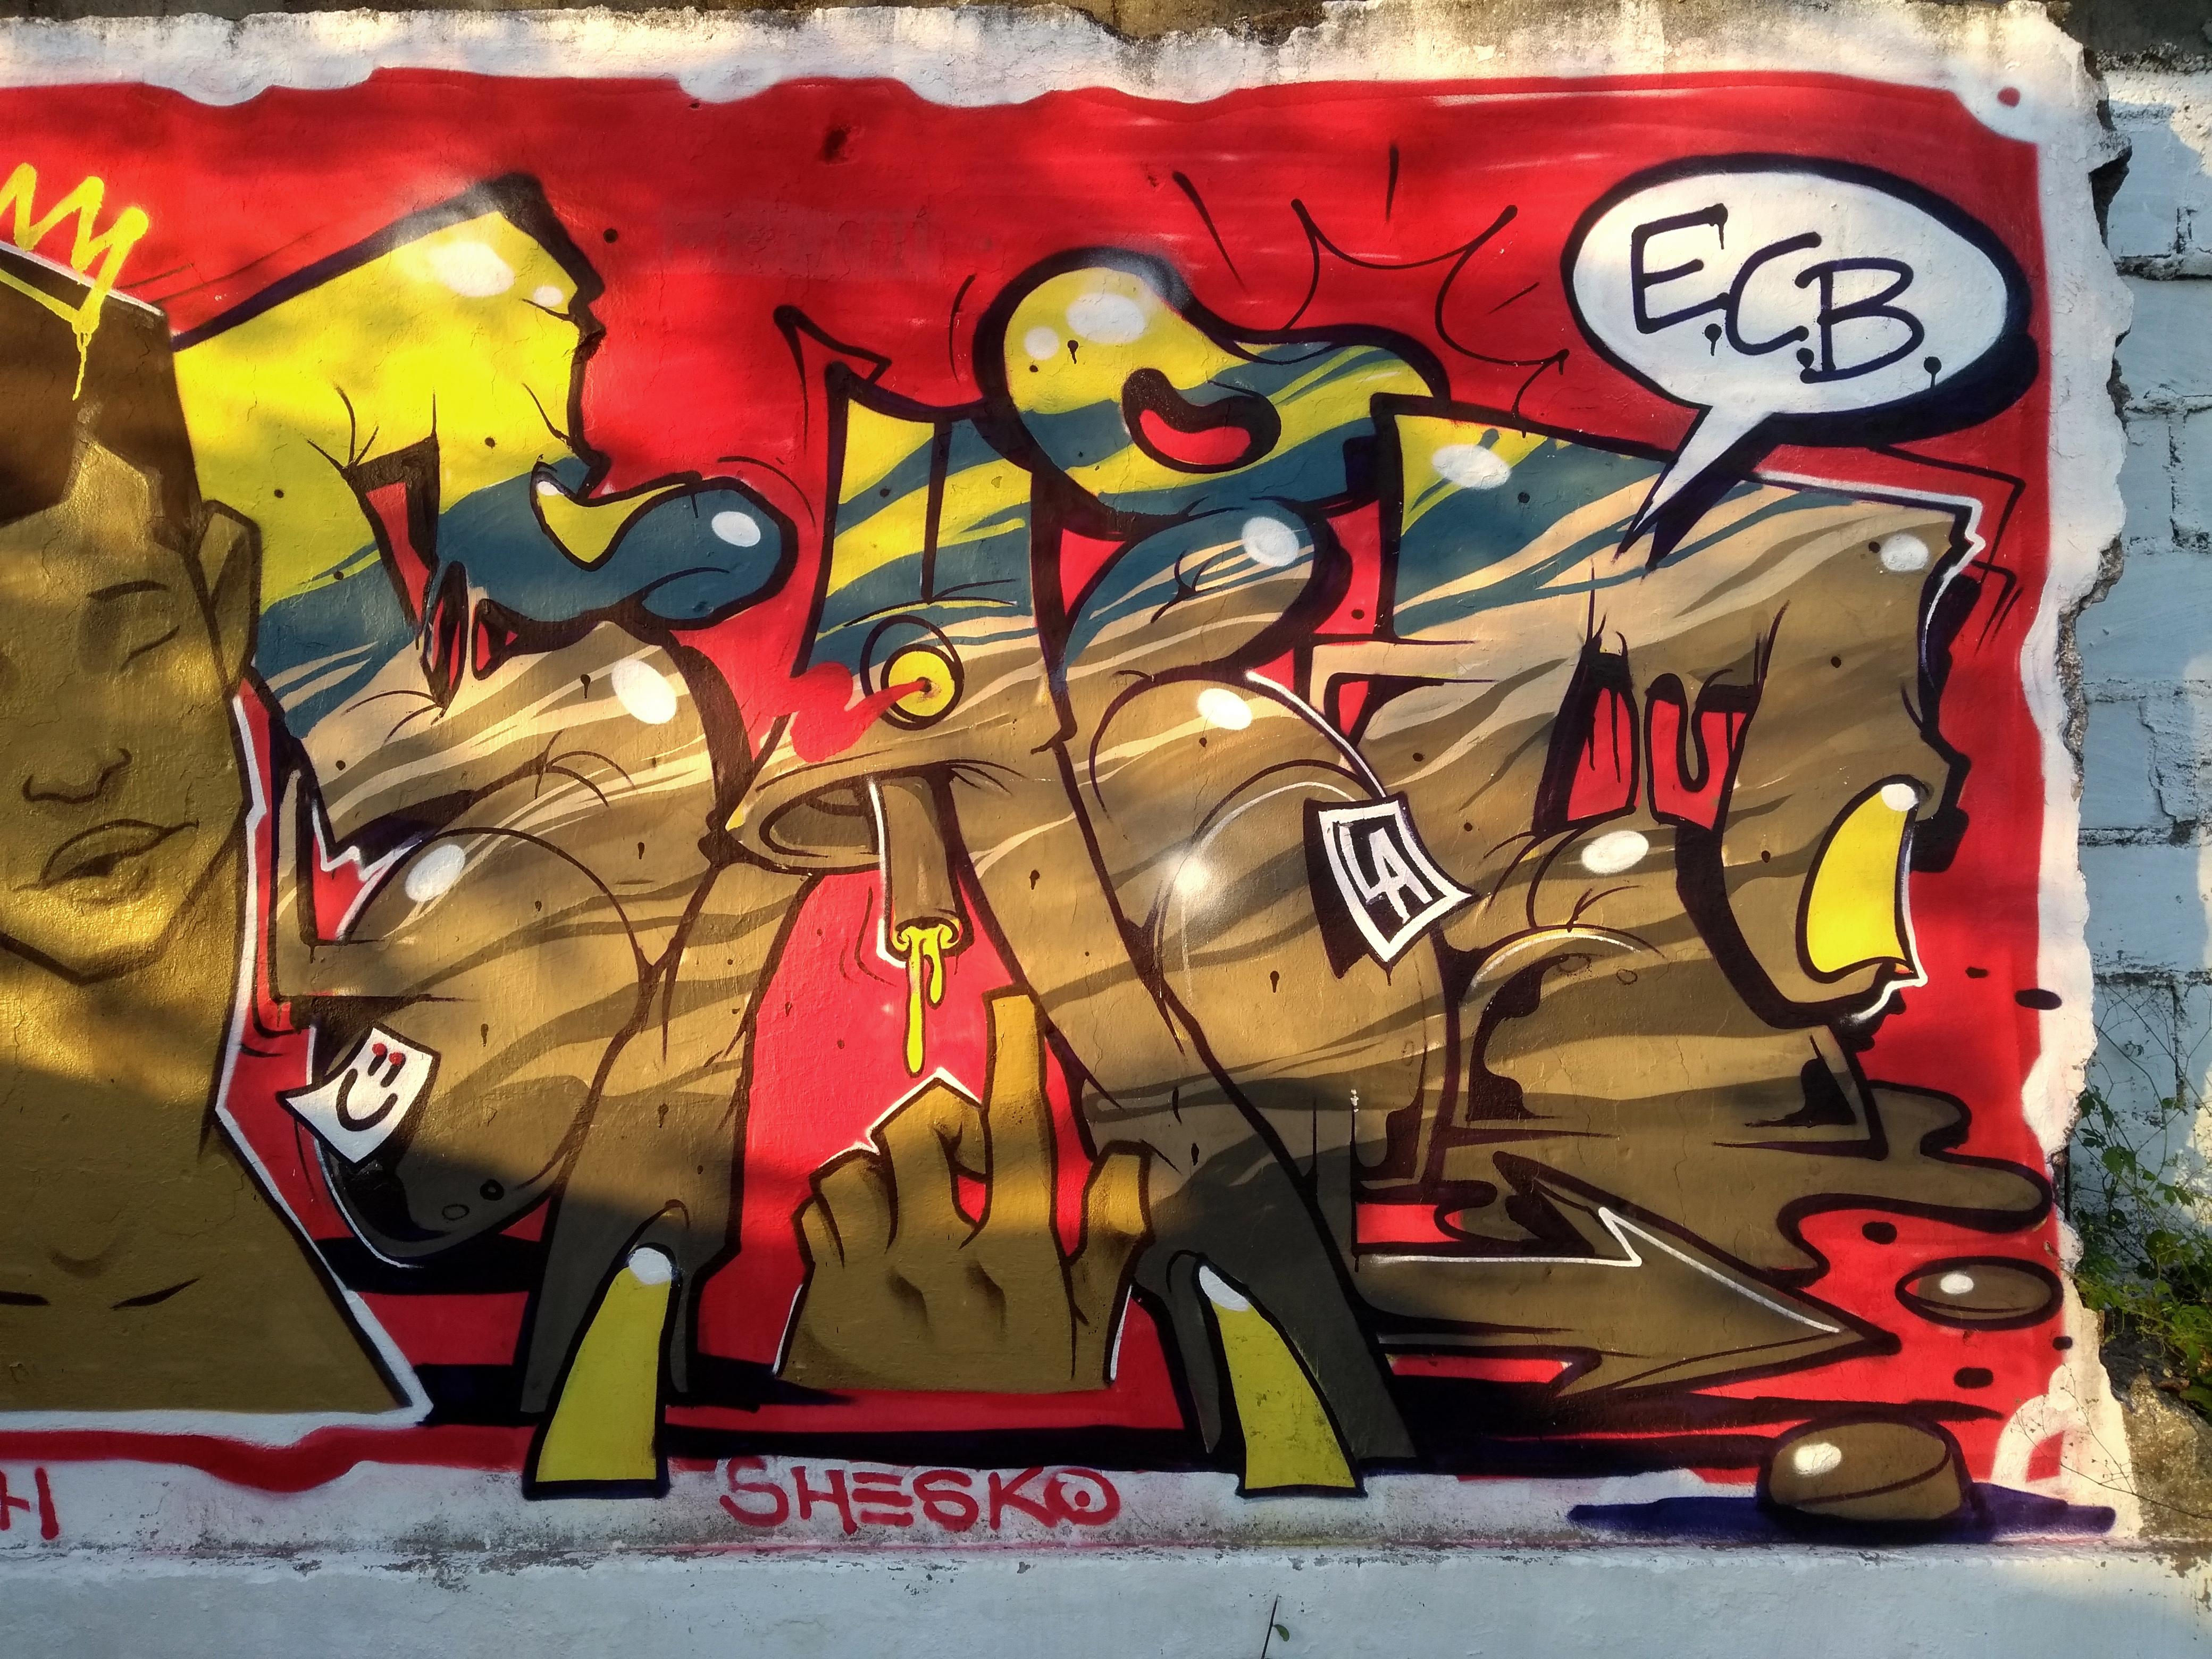 Shesko-Concreto